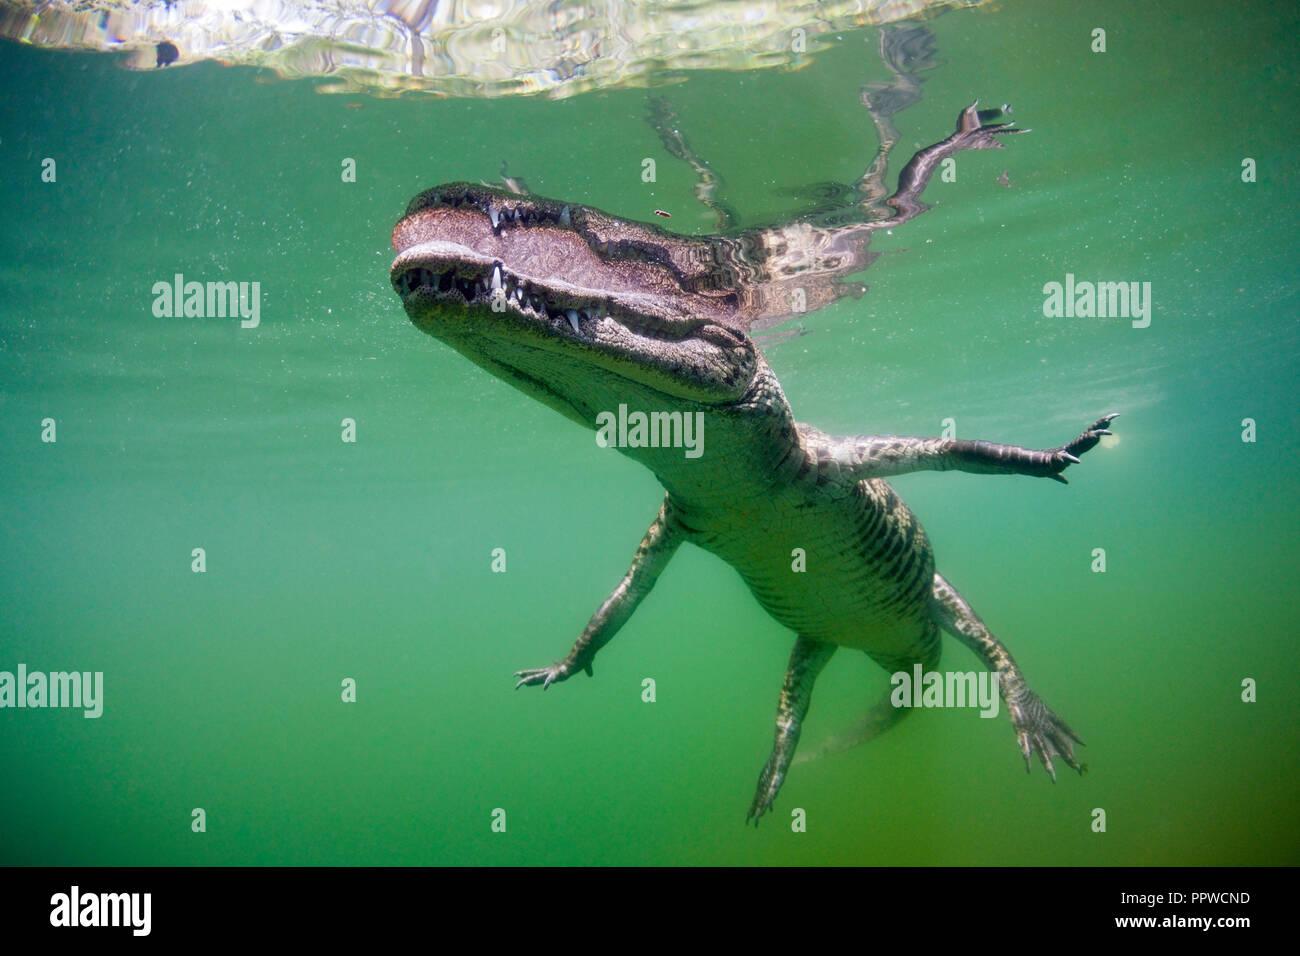 Juvenile American Crocodile, Crocodylus acutus, Florida, Everglades, USA - Stock Image